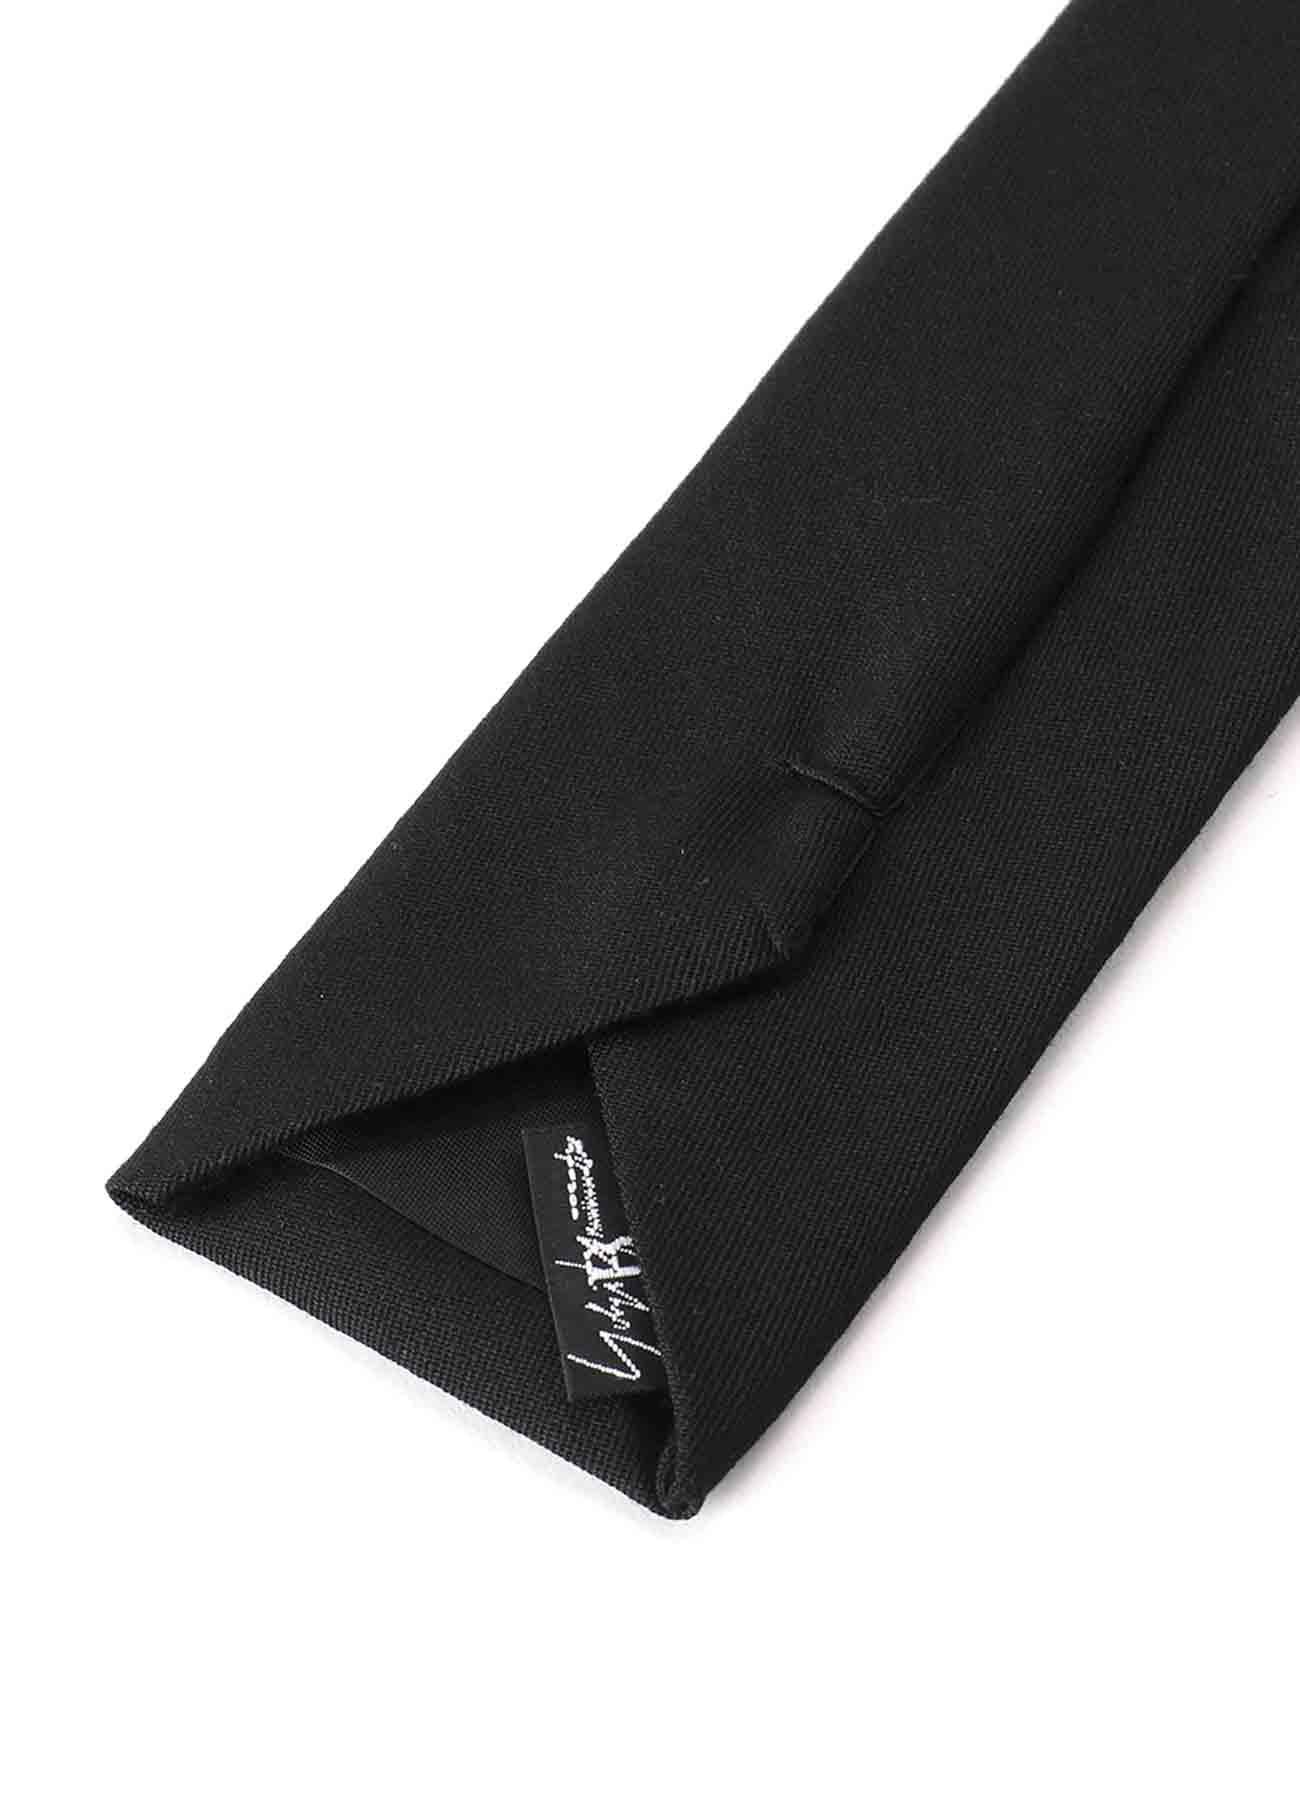 B/ Wool Gabardine Embroidery Tie ''山本耀司''